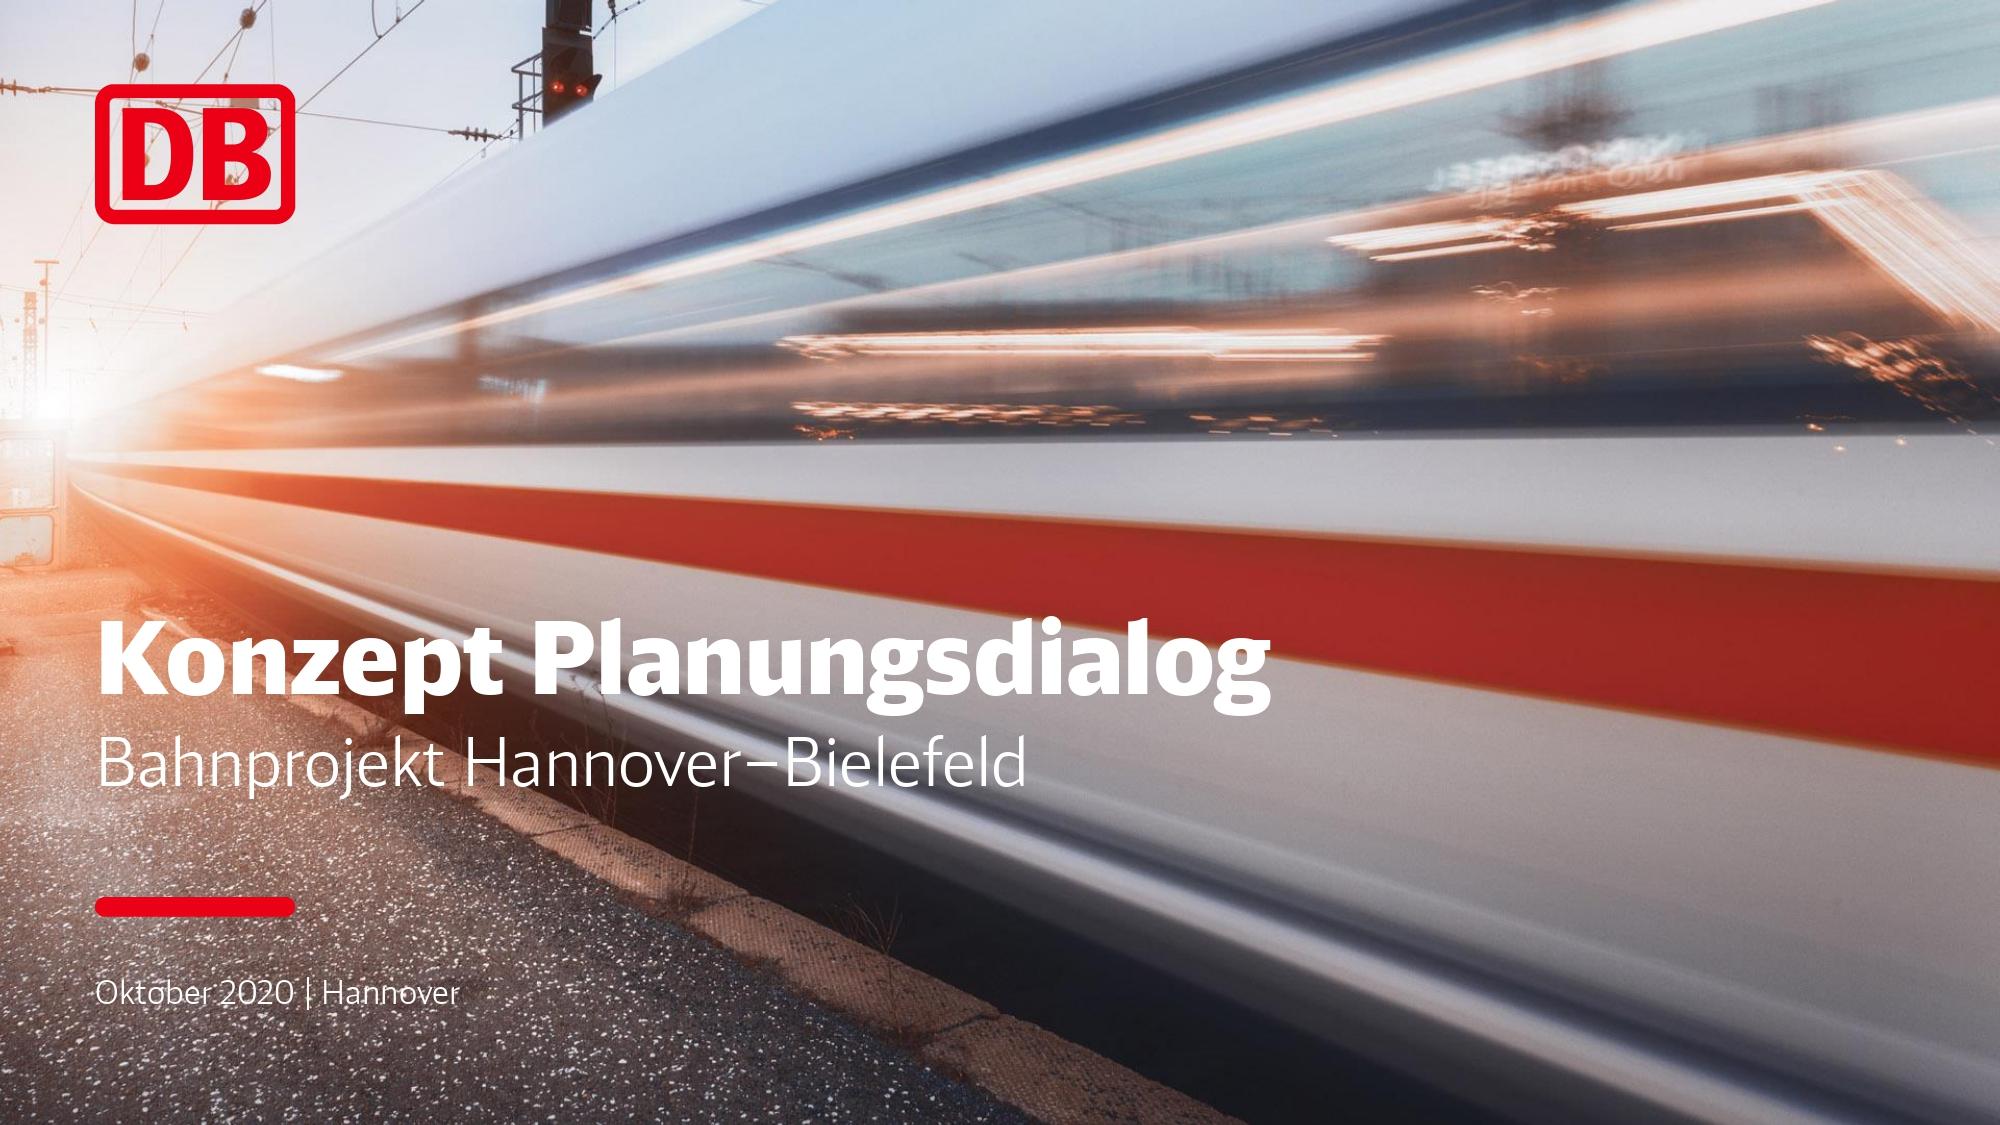 DB, Planungsdialog - 25.11.2020